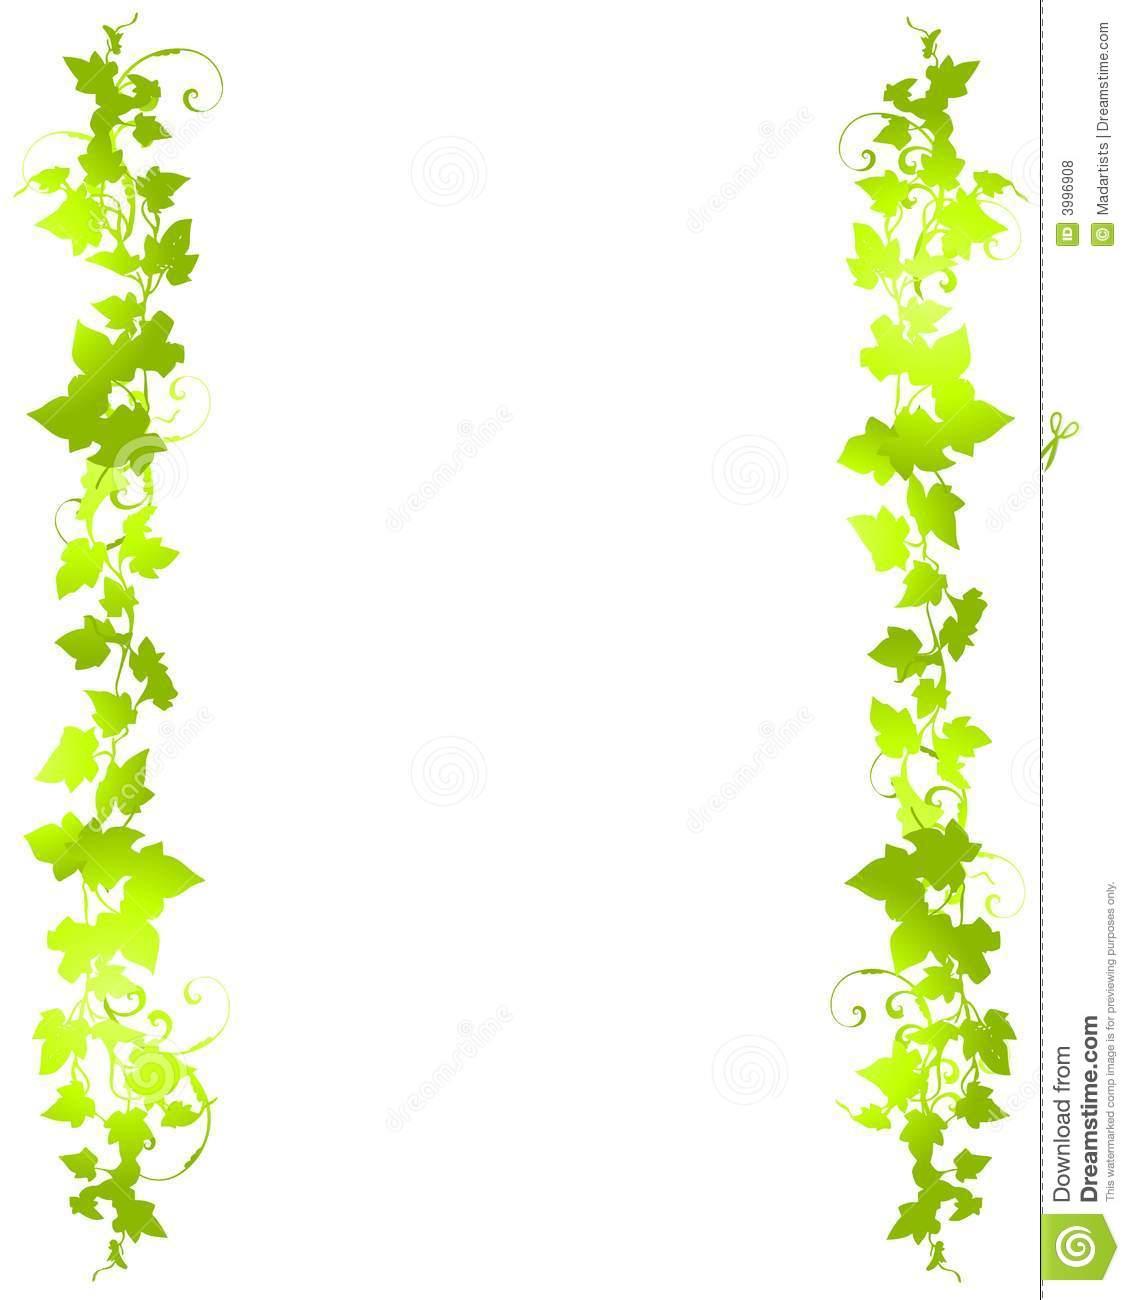 Leaf Background Clipart.